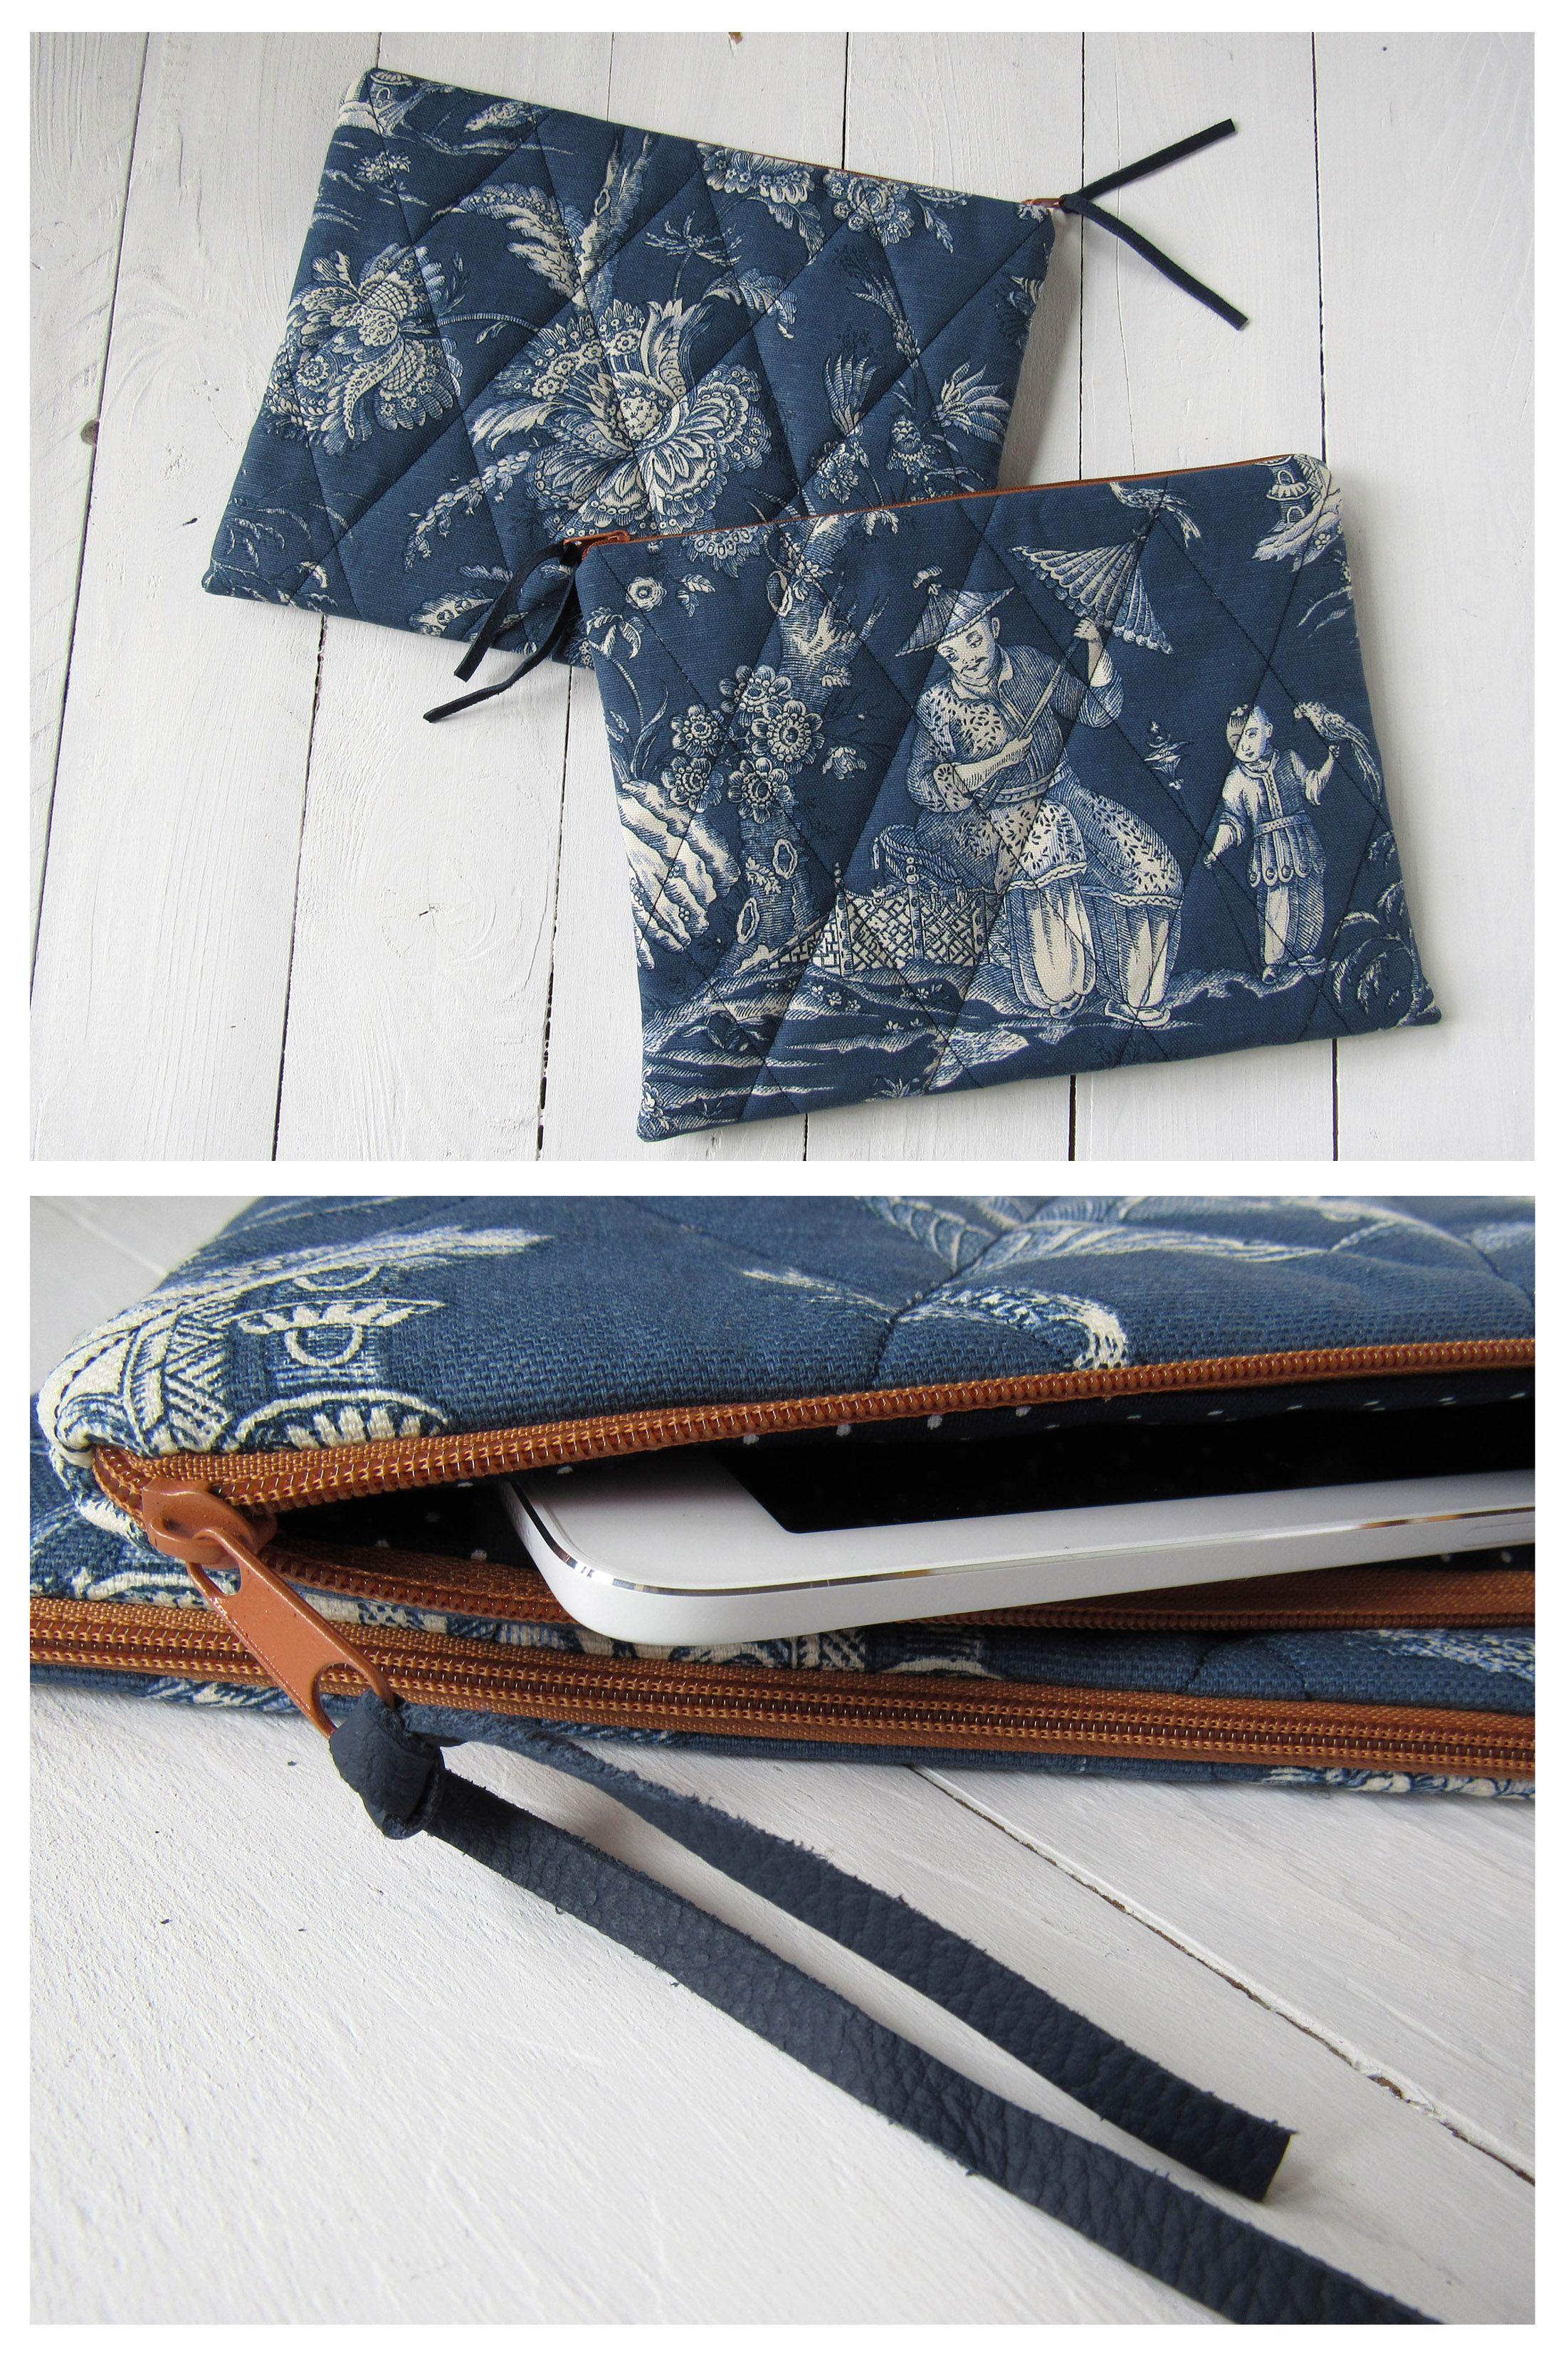 9 7 Ipad Tasche Toile De Jouy Blau Weiss Chinoiserie Lederband Blau 9 7 Zoll Ereader Hulle Gesteppt Tablet Zubehor Schutzhulle Etsy Art Support Handmade Etsy Finds